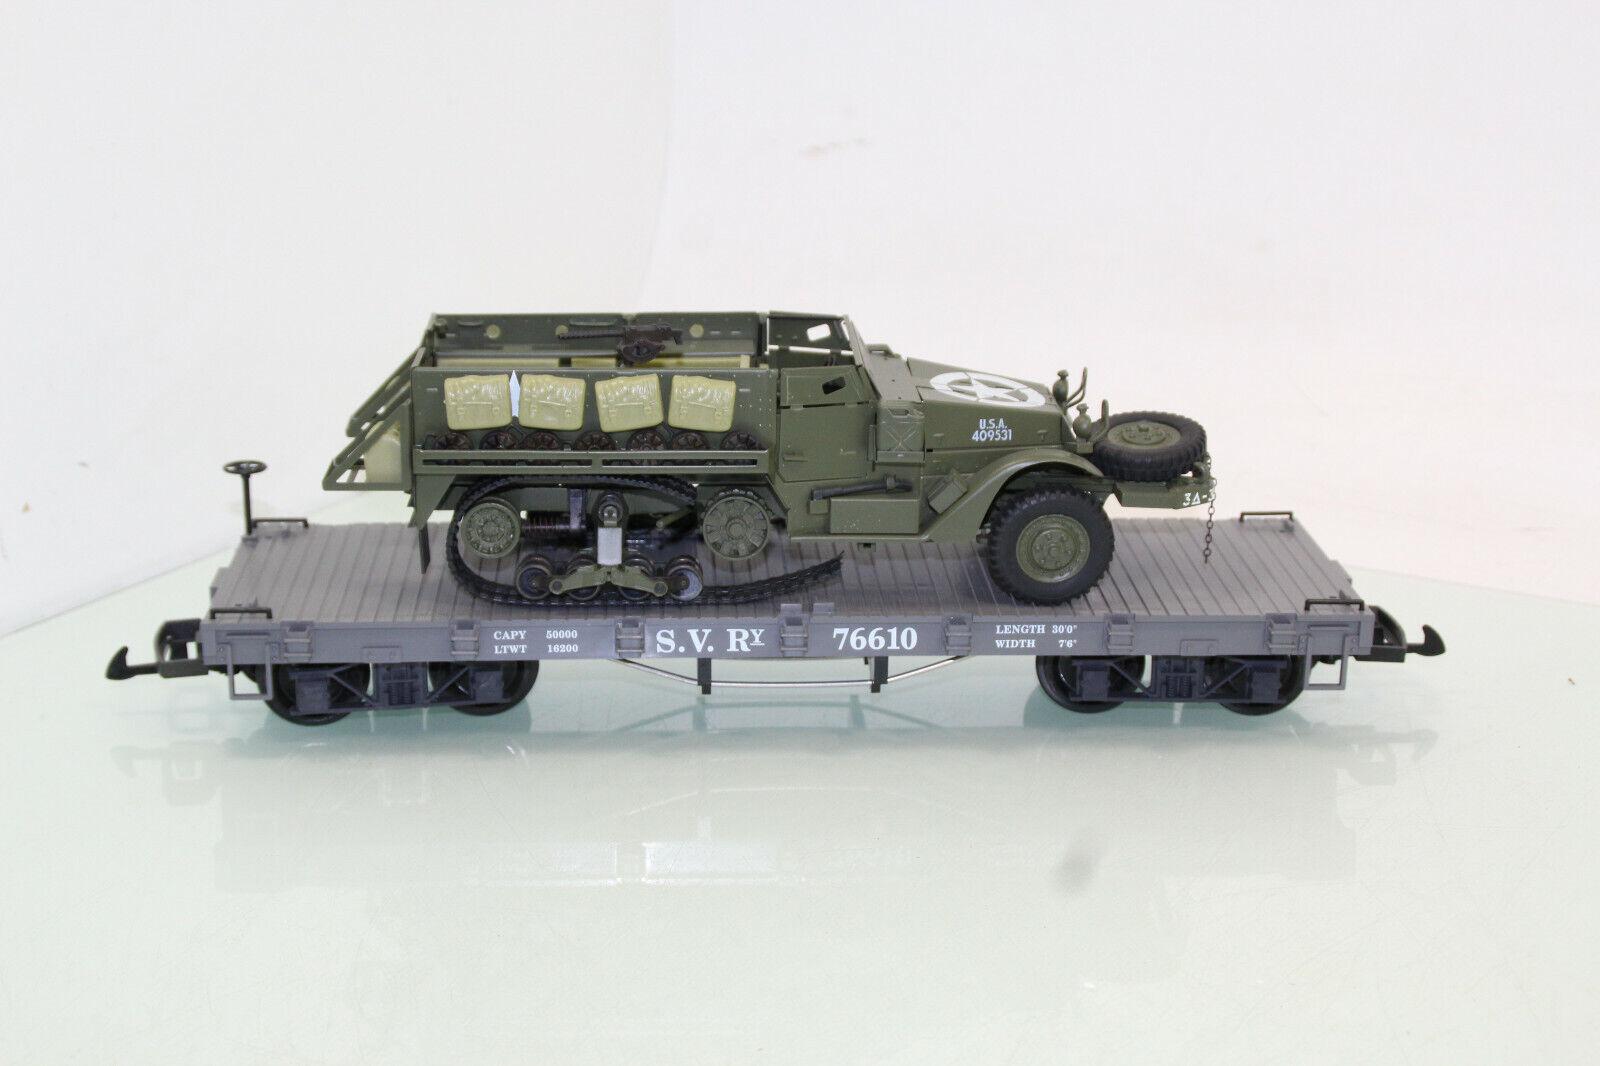 Lgb gonio Spur g 76610 flachwagen tablet American MIT halbraupenfahrzeg (js7717) o